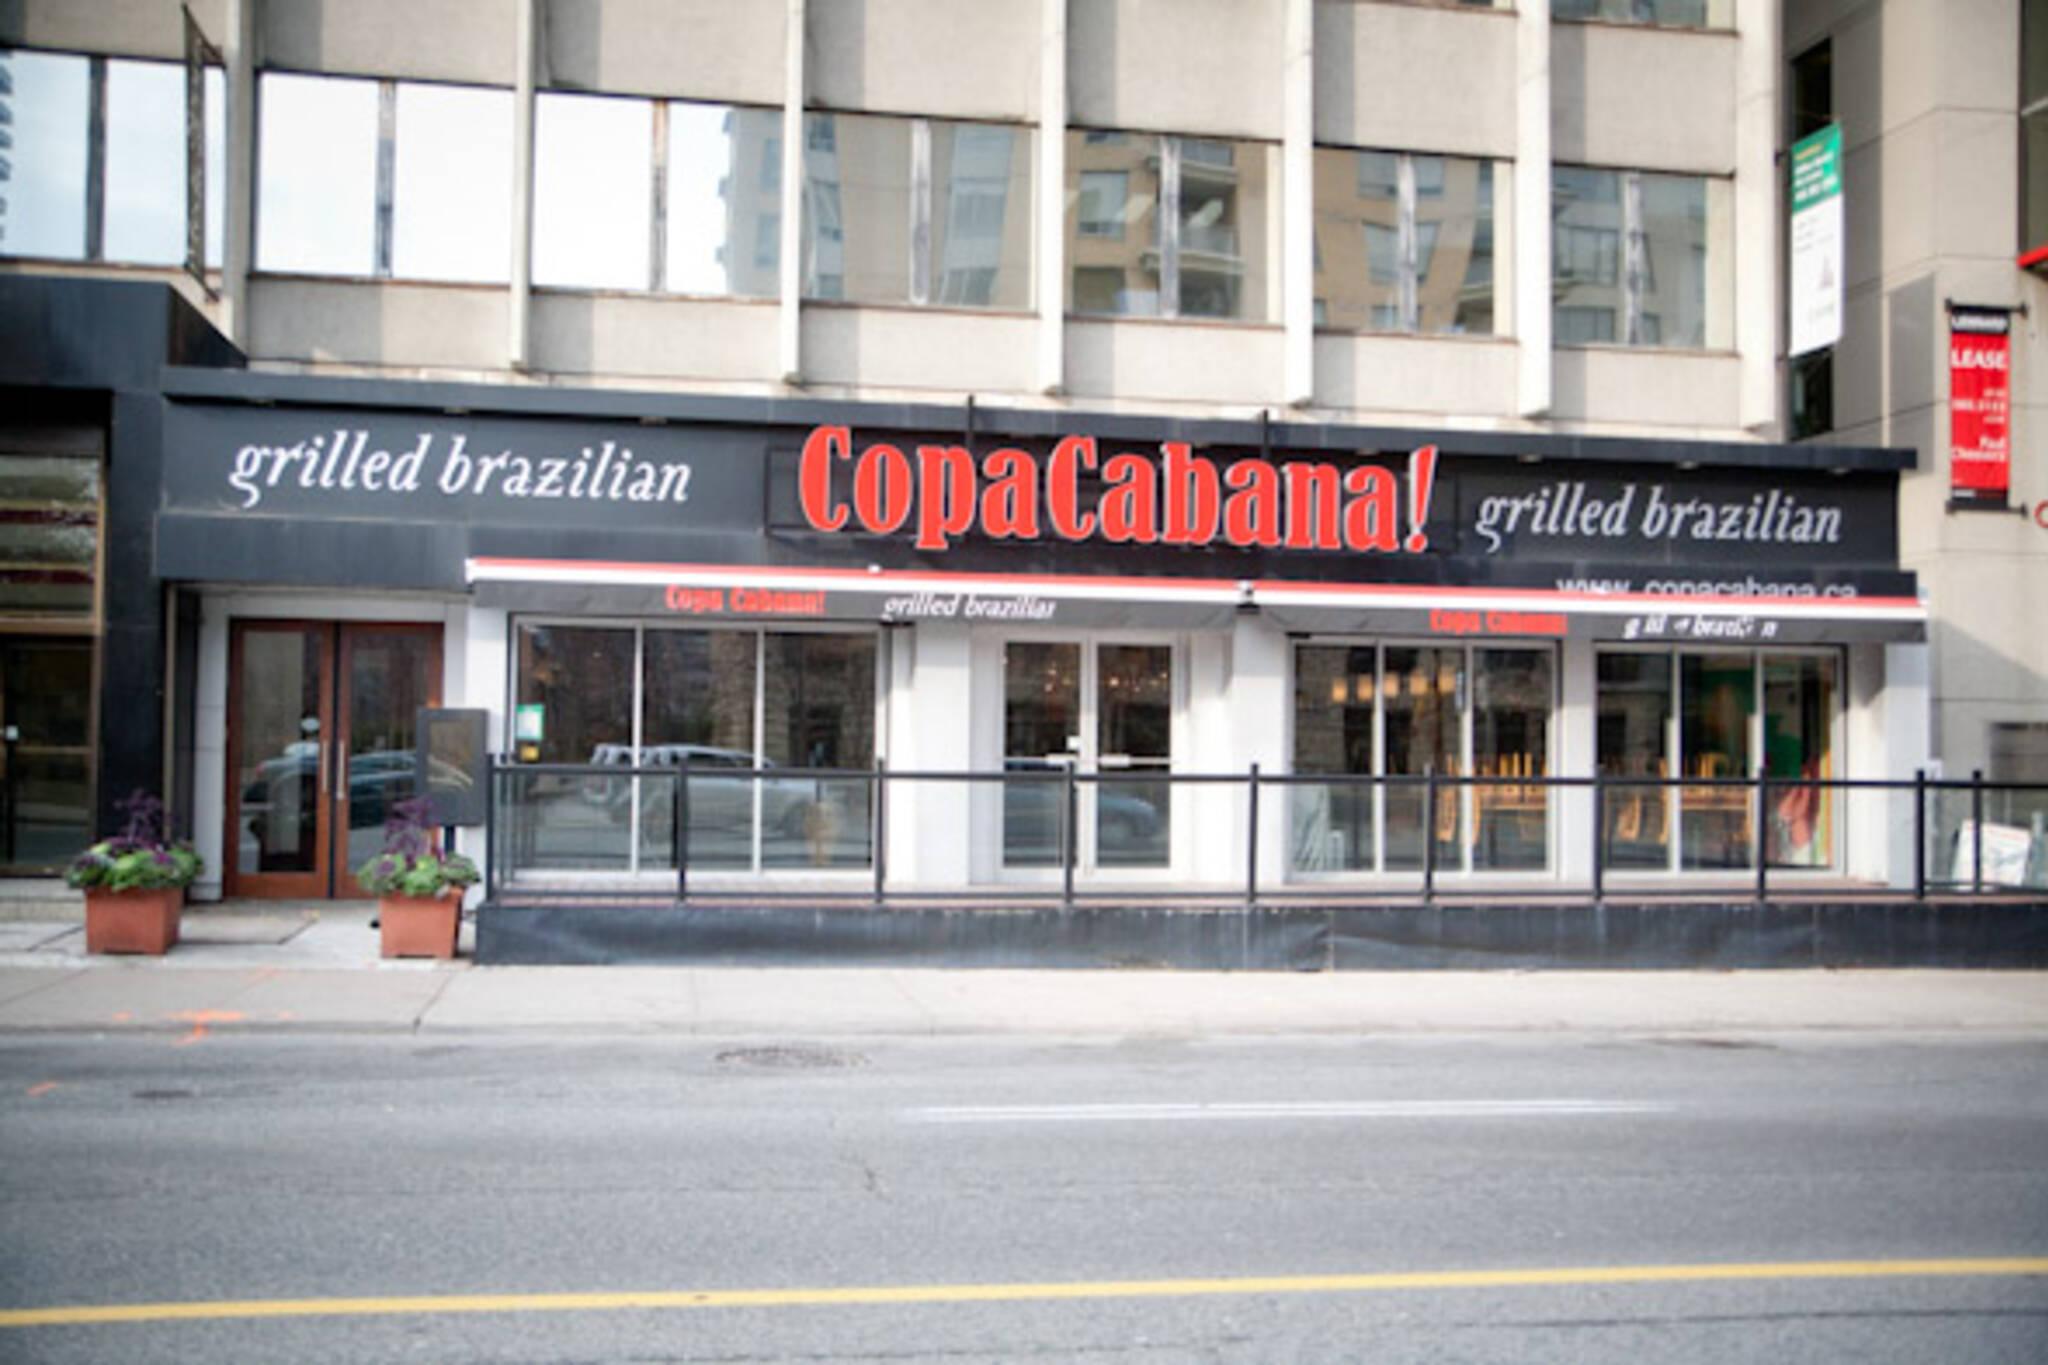 Copacabana Restaurant